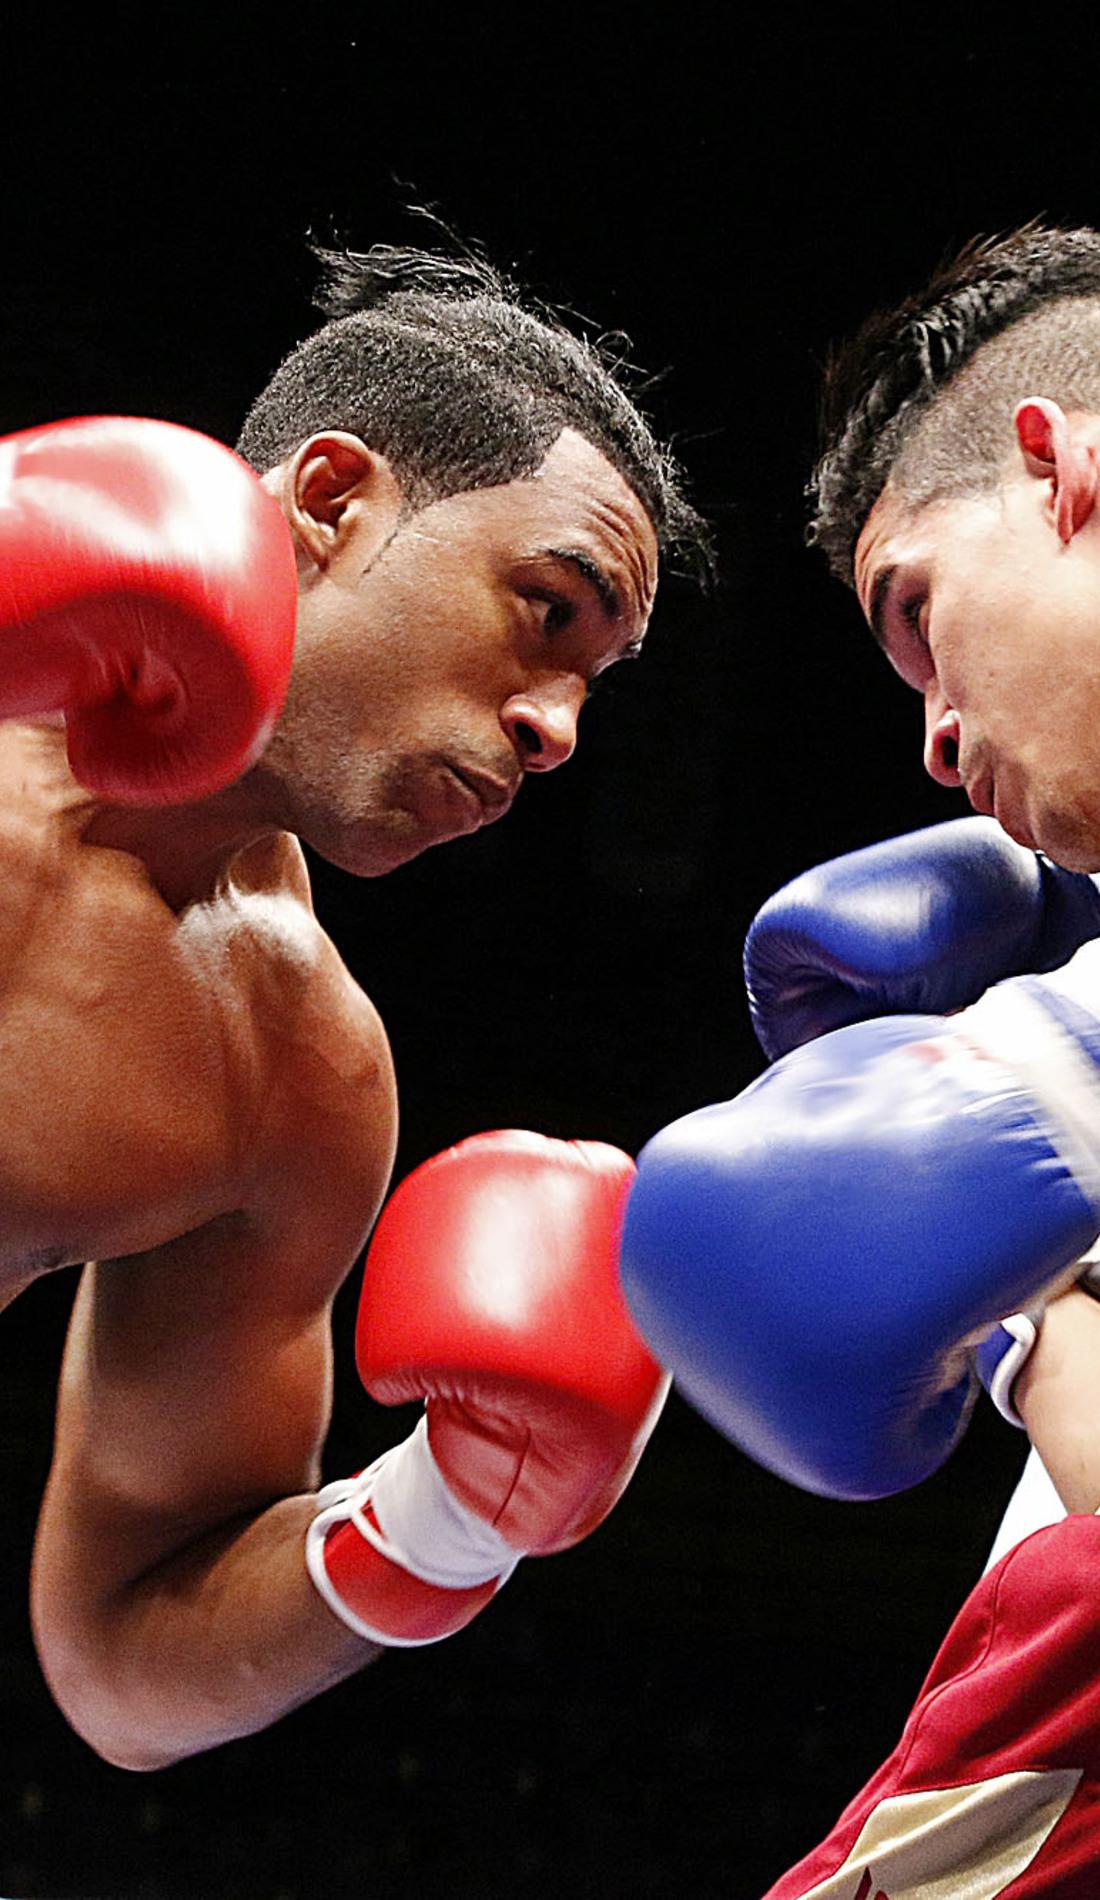 A Premier Boxing Champions live event